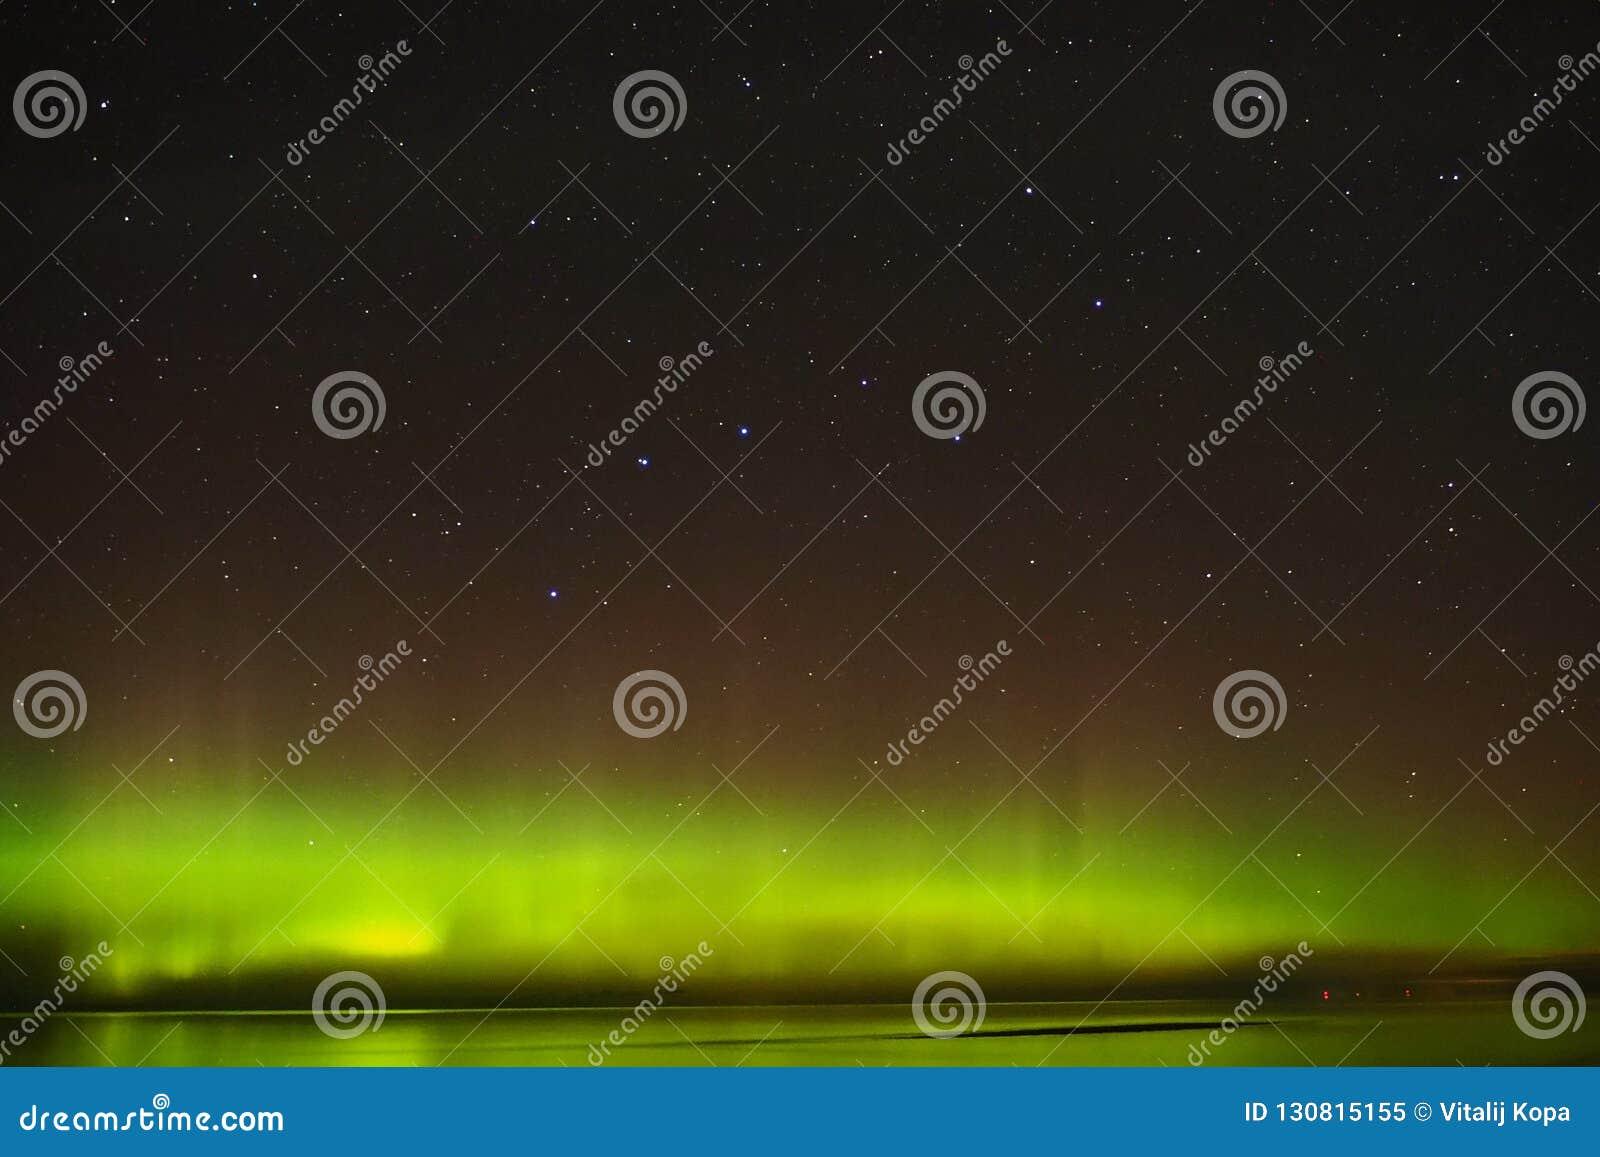 Aurora polar lights big dipper constellation stars